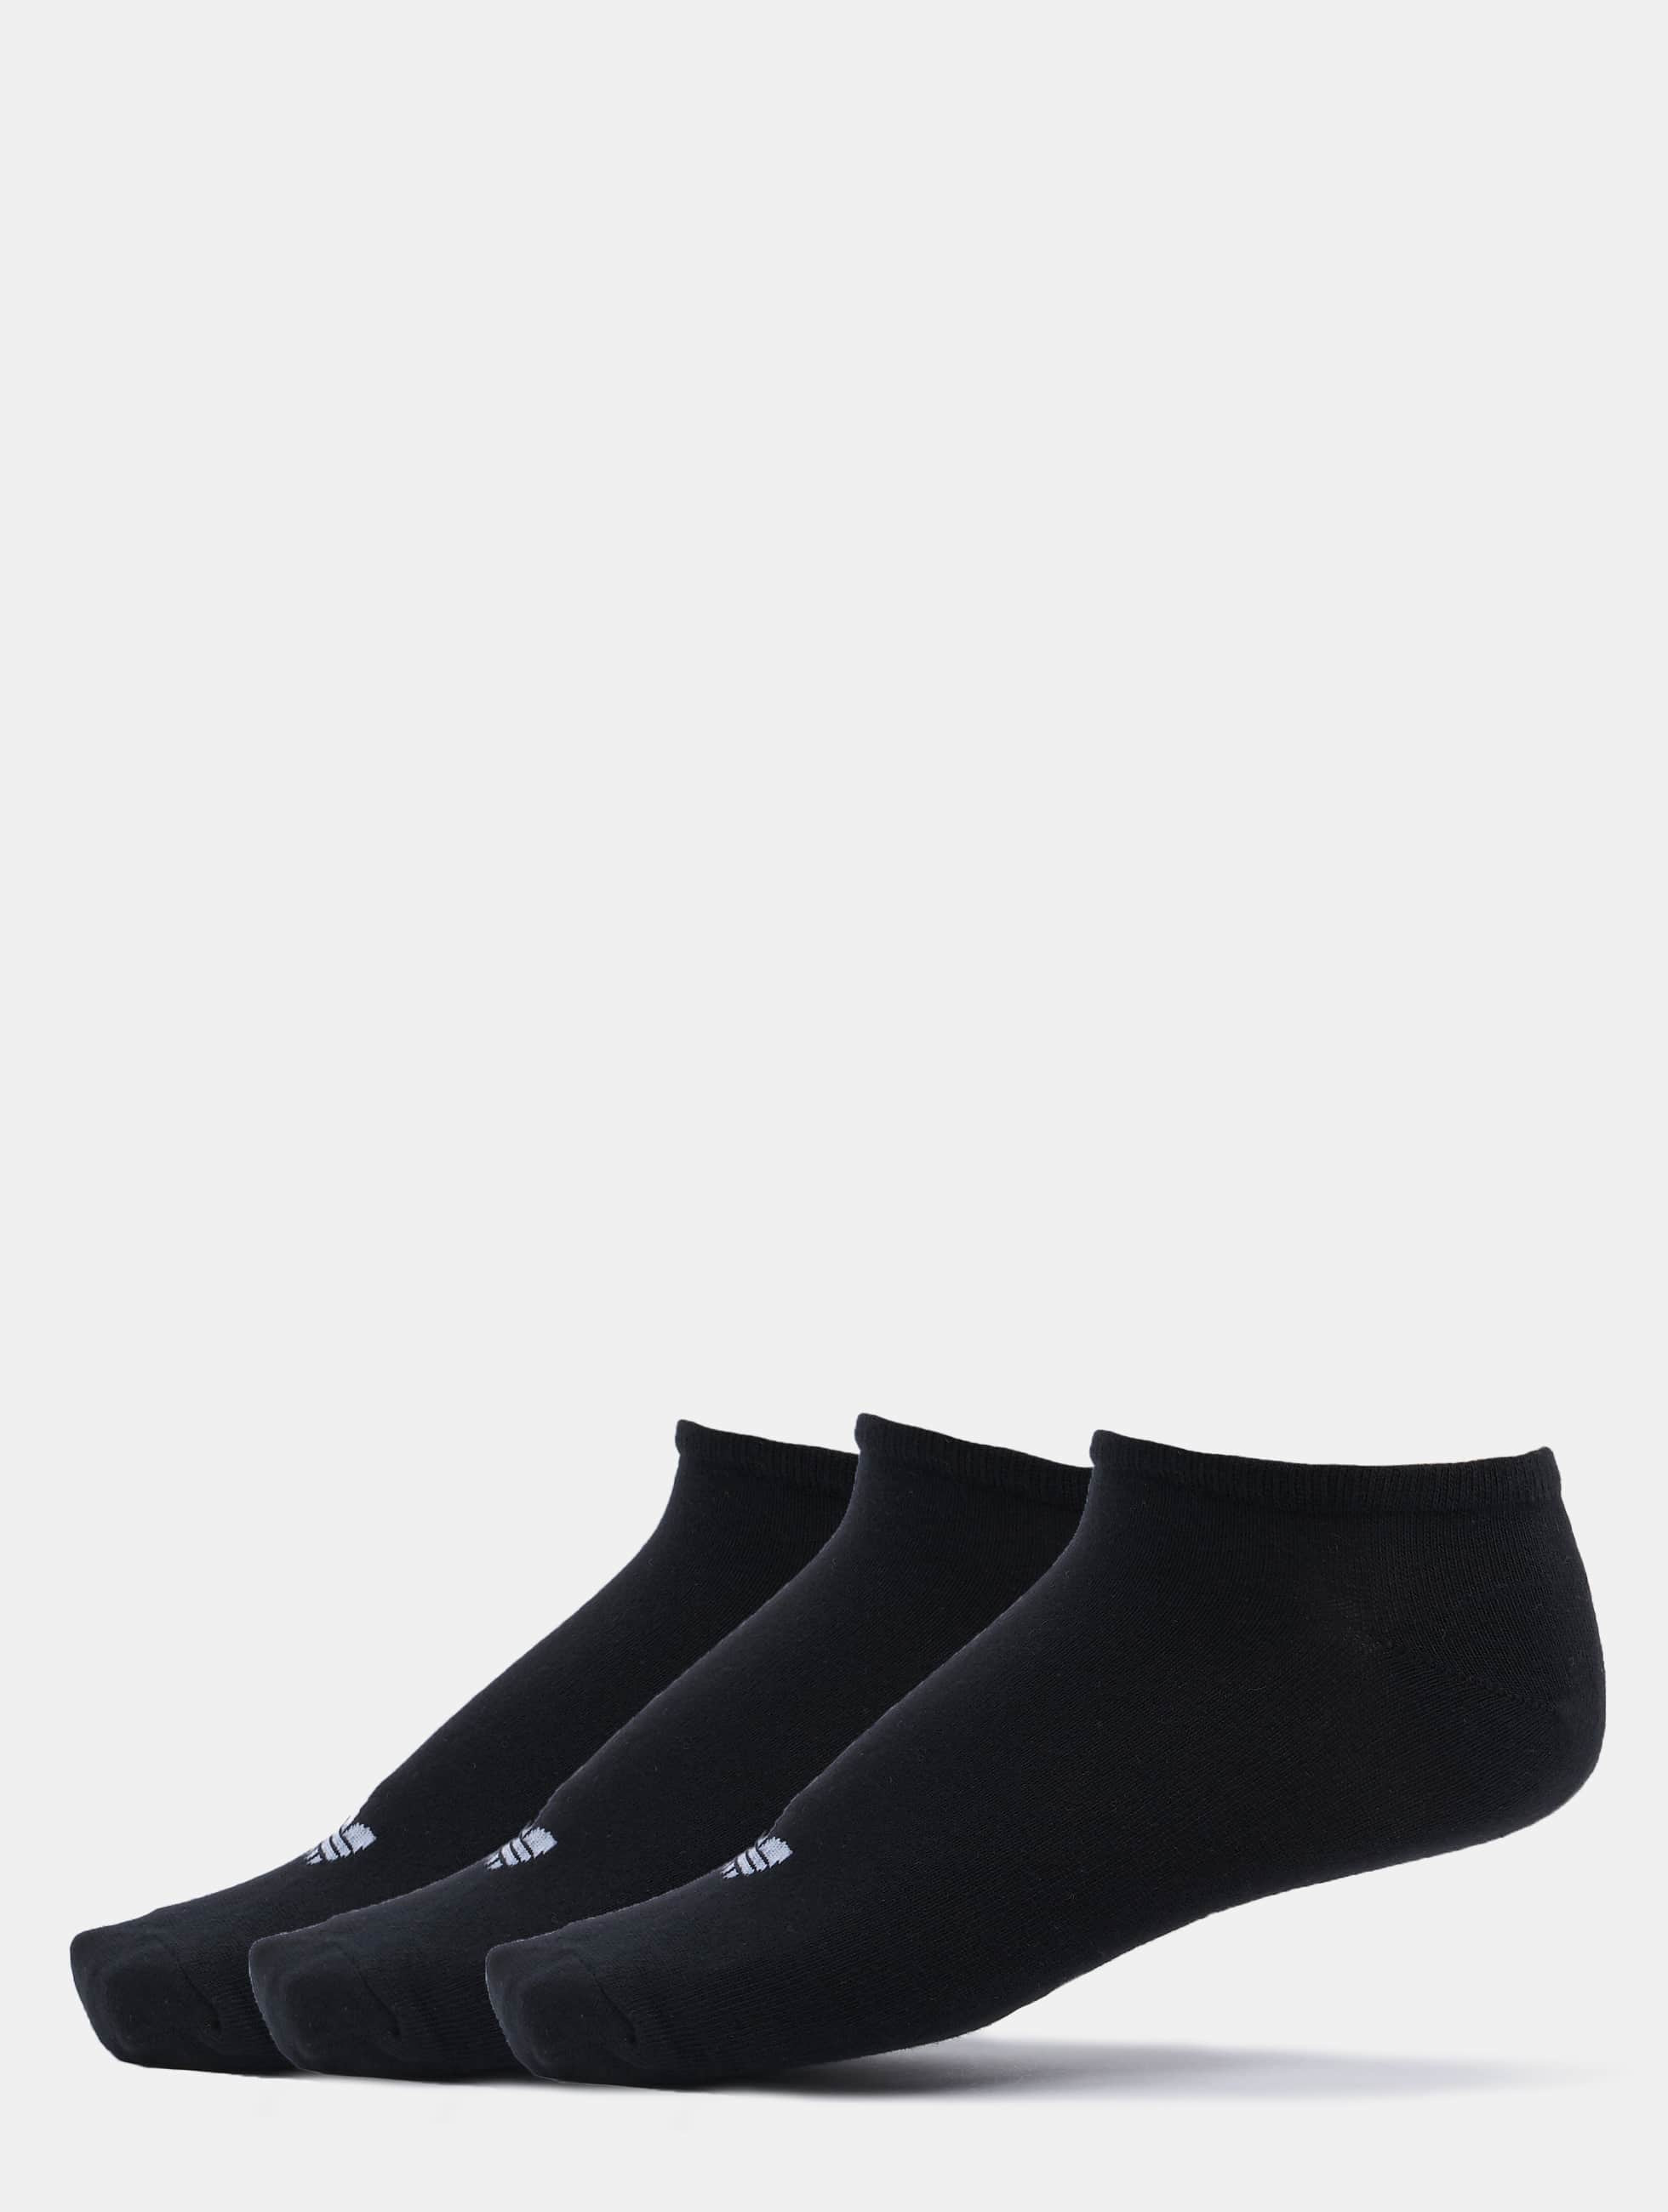 adidas Sokken S20274 zwart